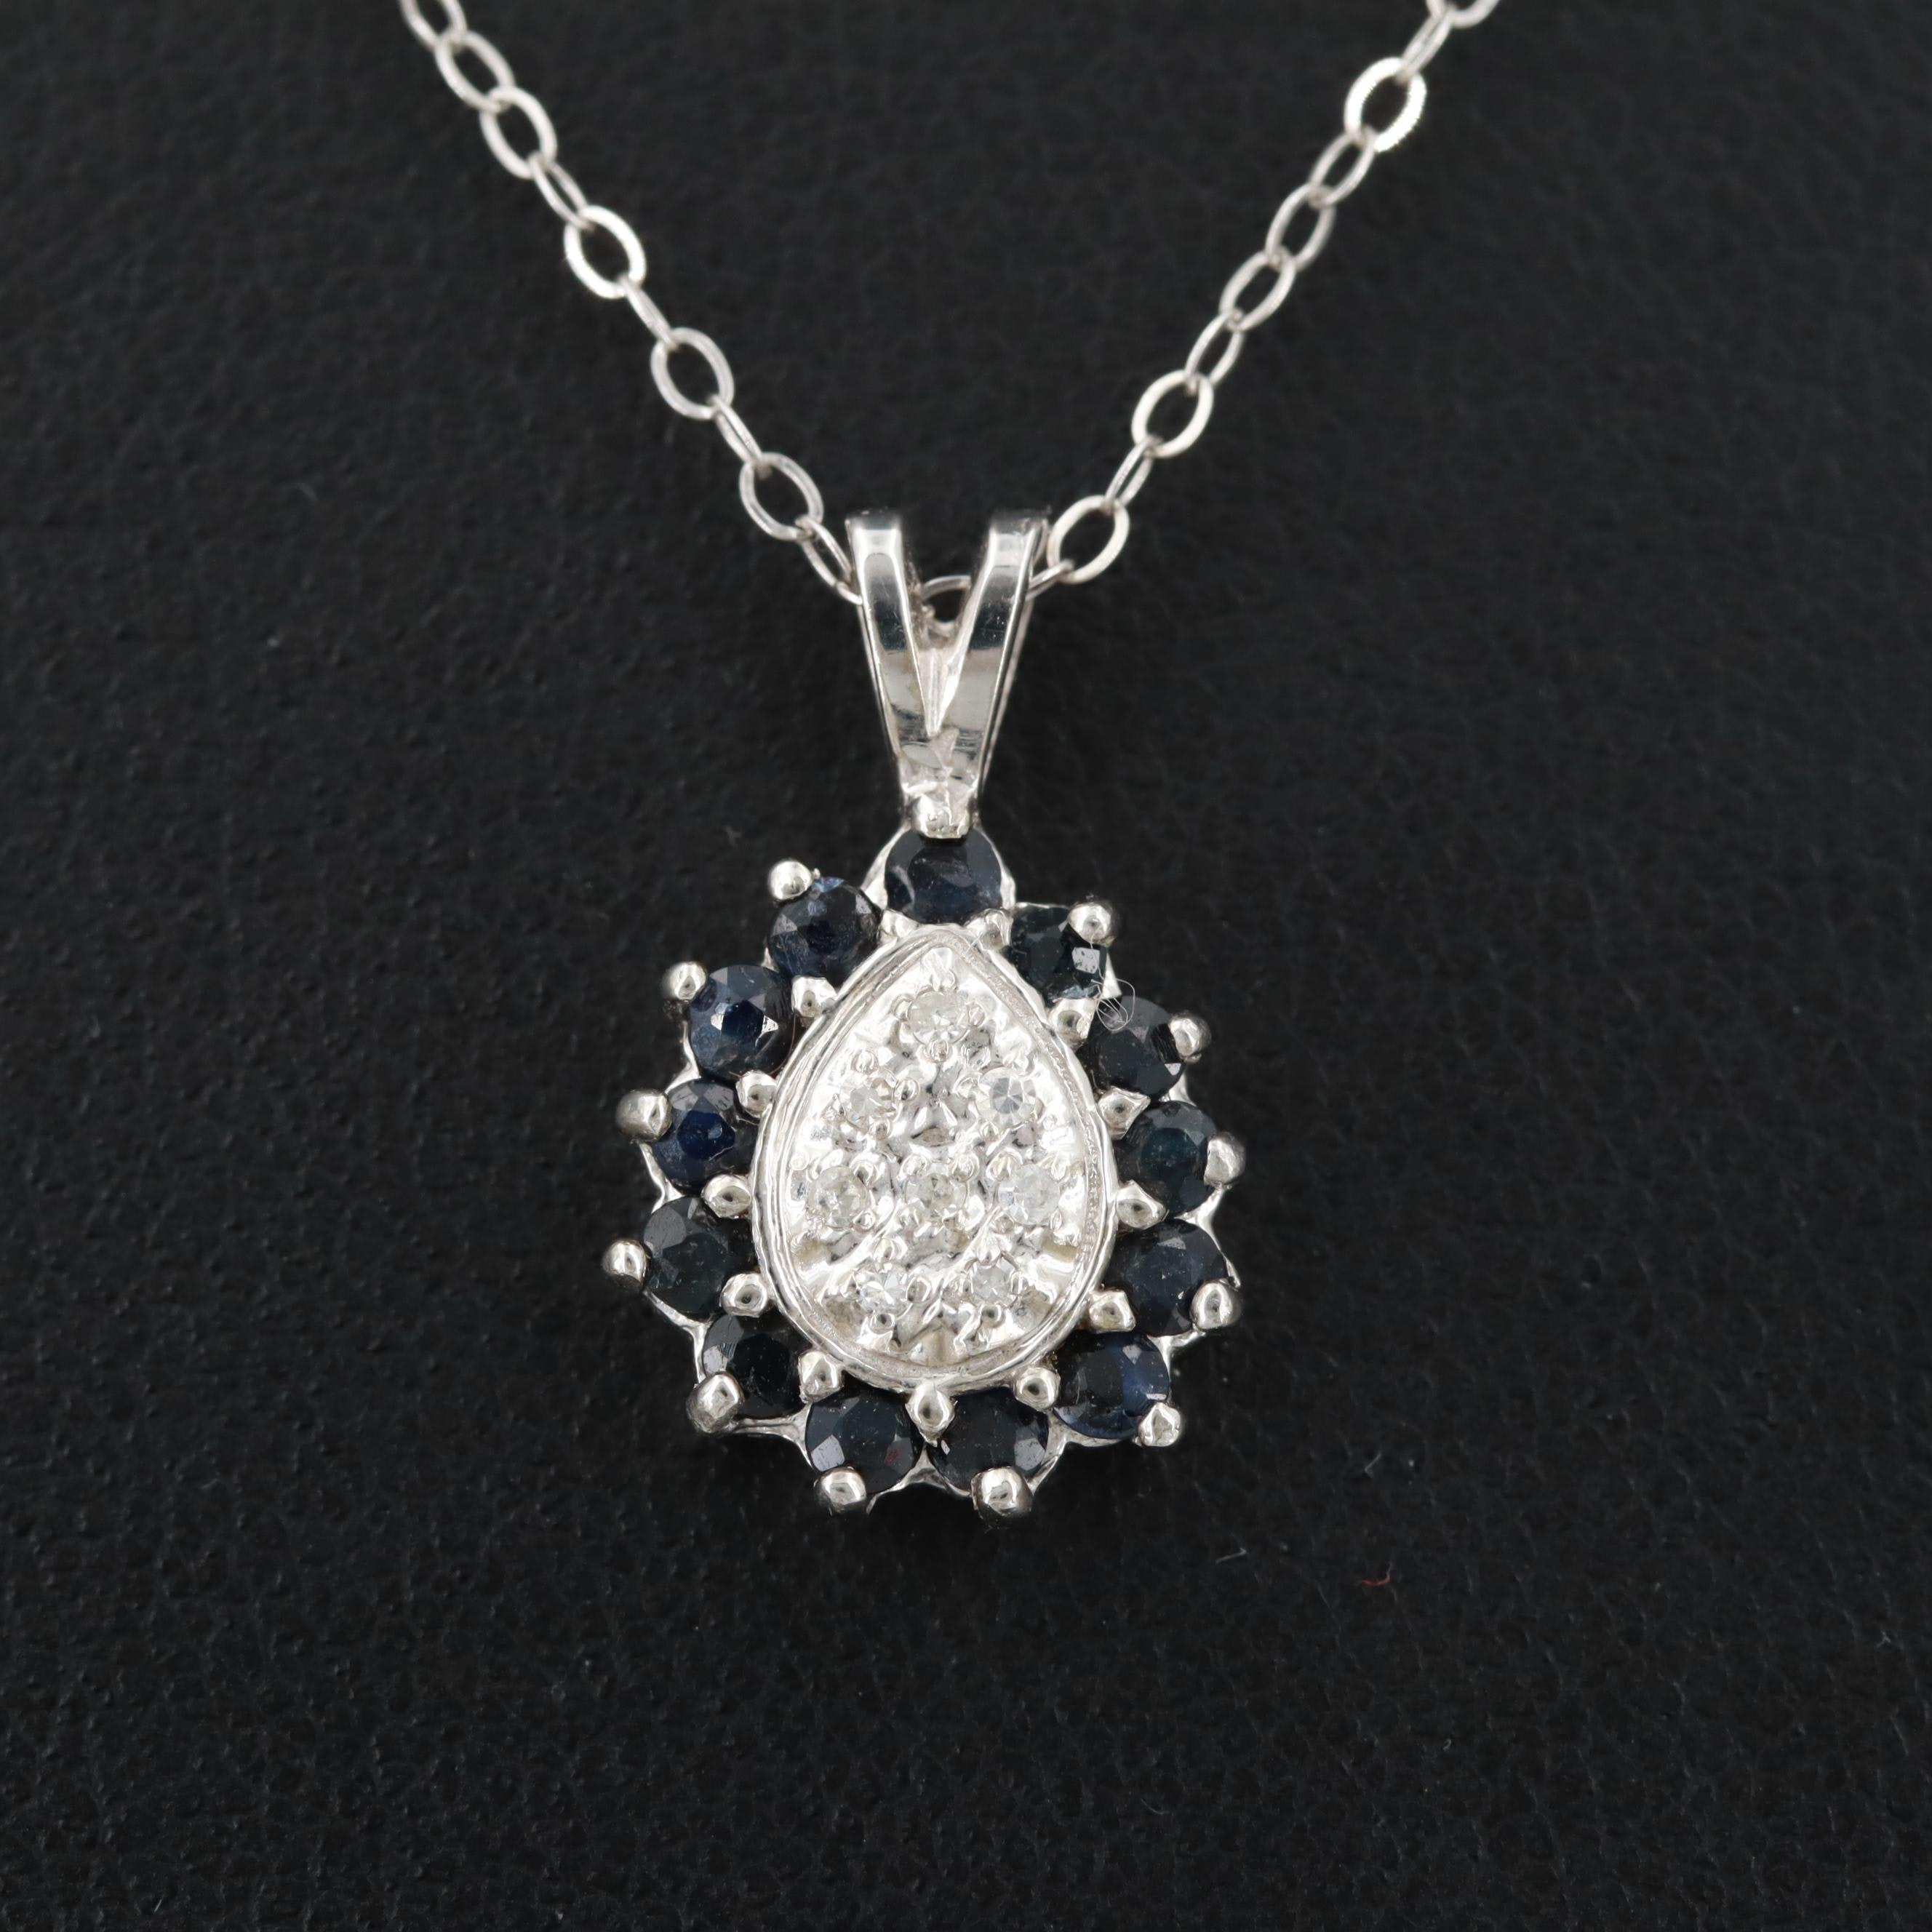 10K White Gold Sapphire and Diamond Pendant Necklace